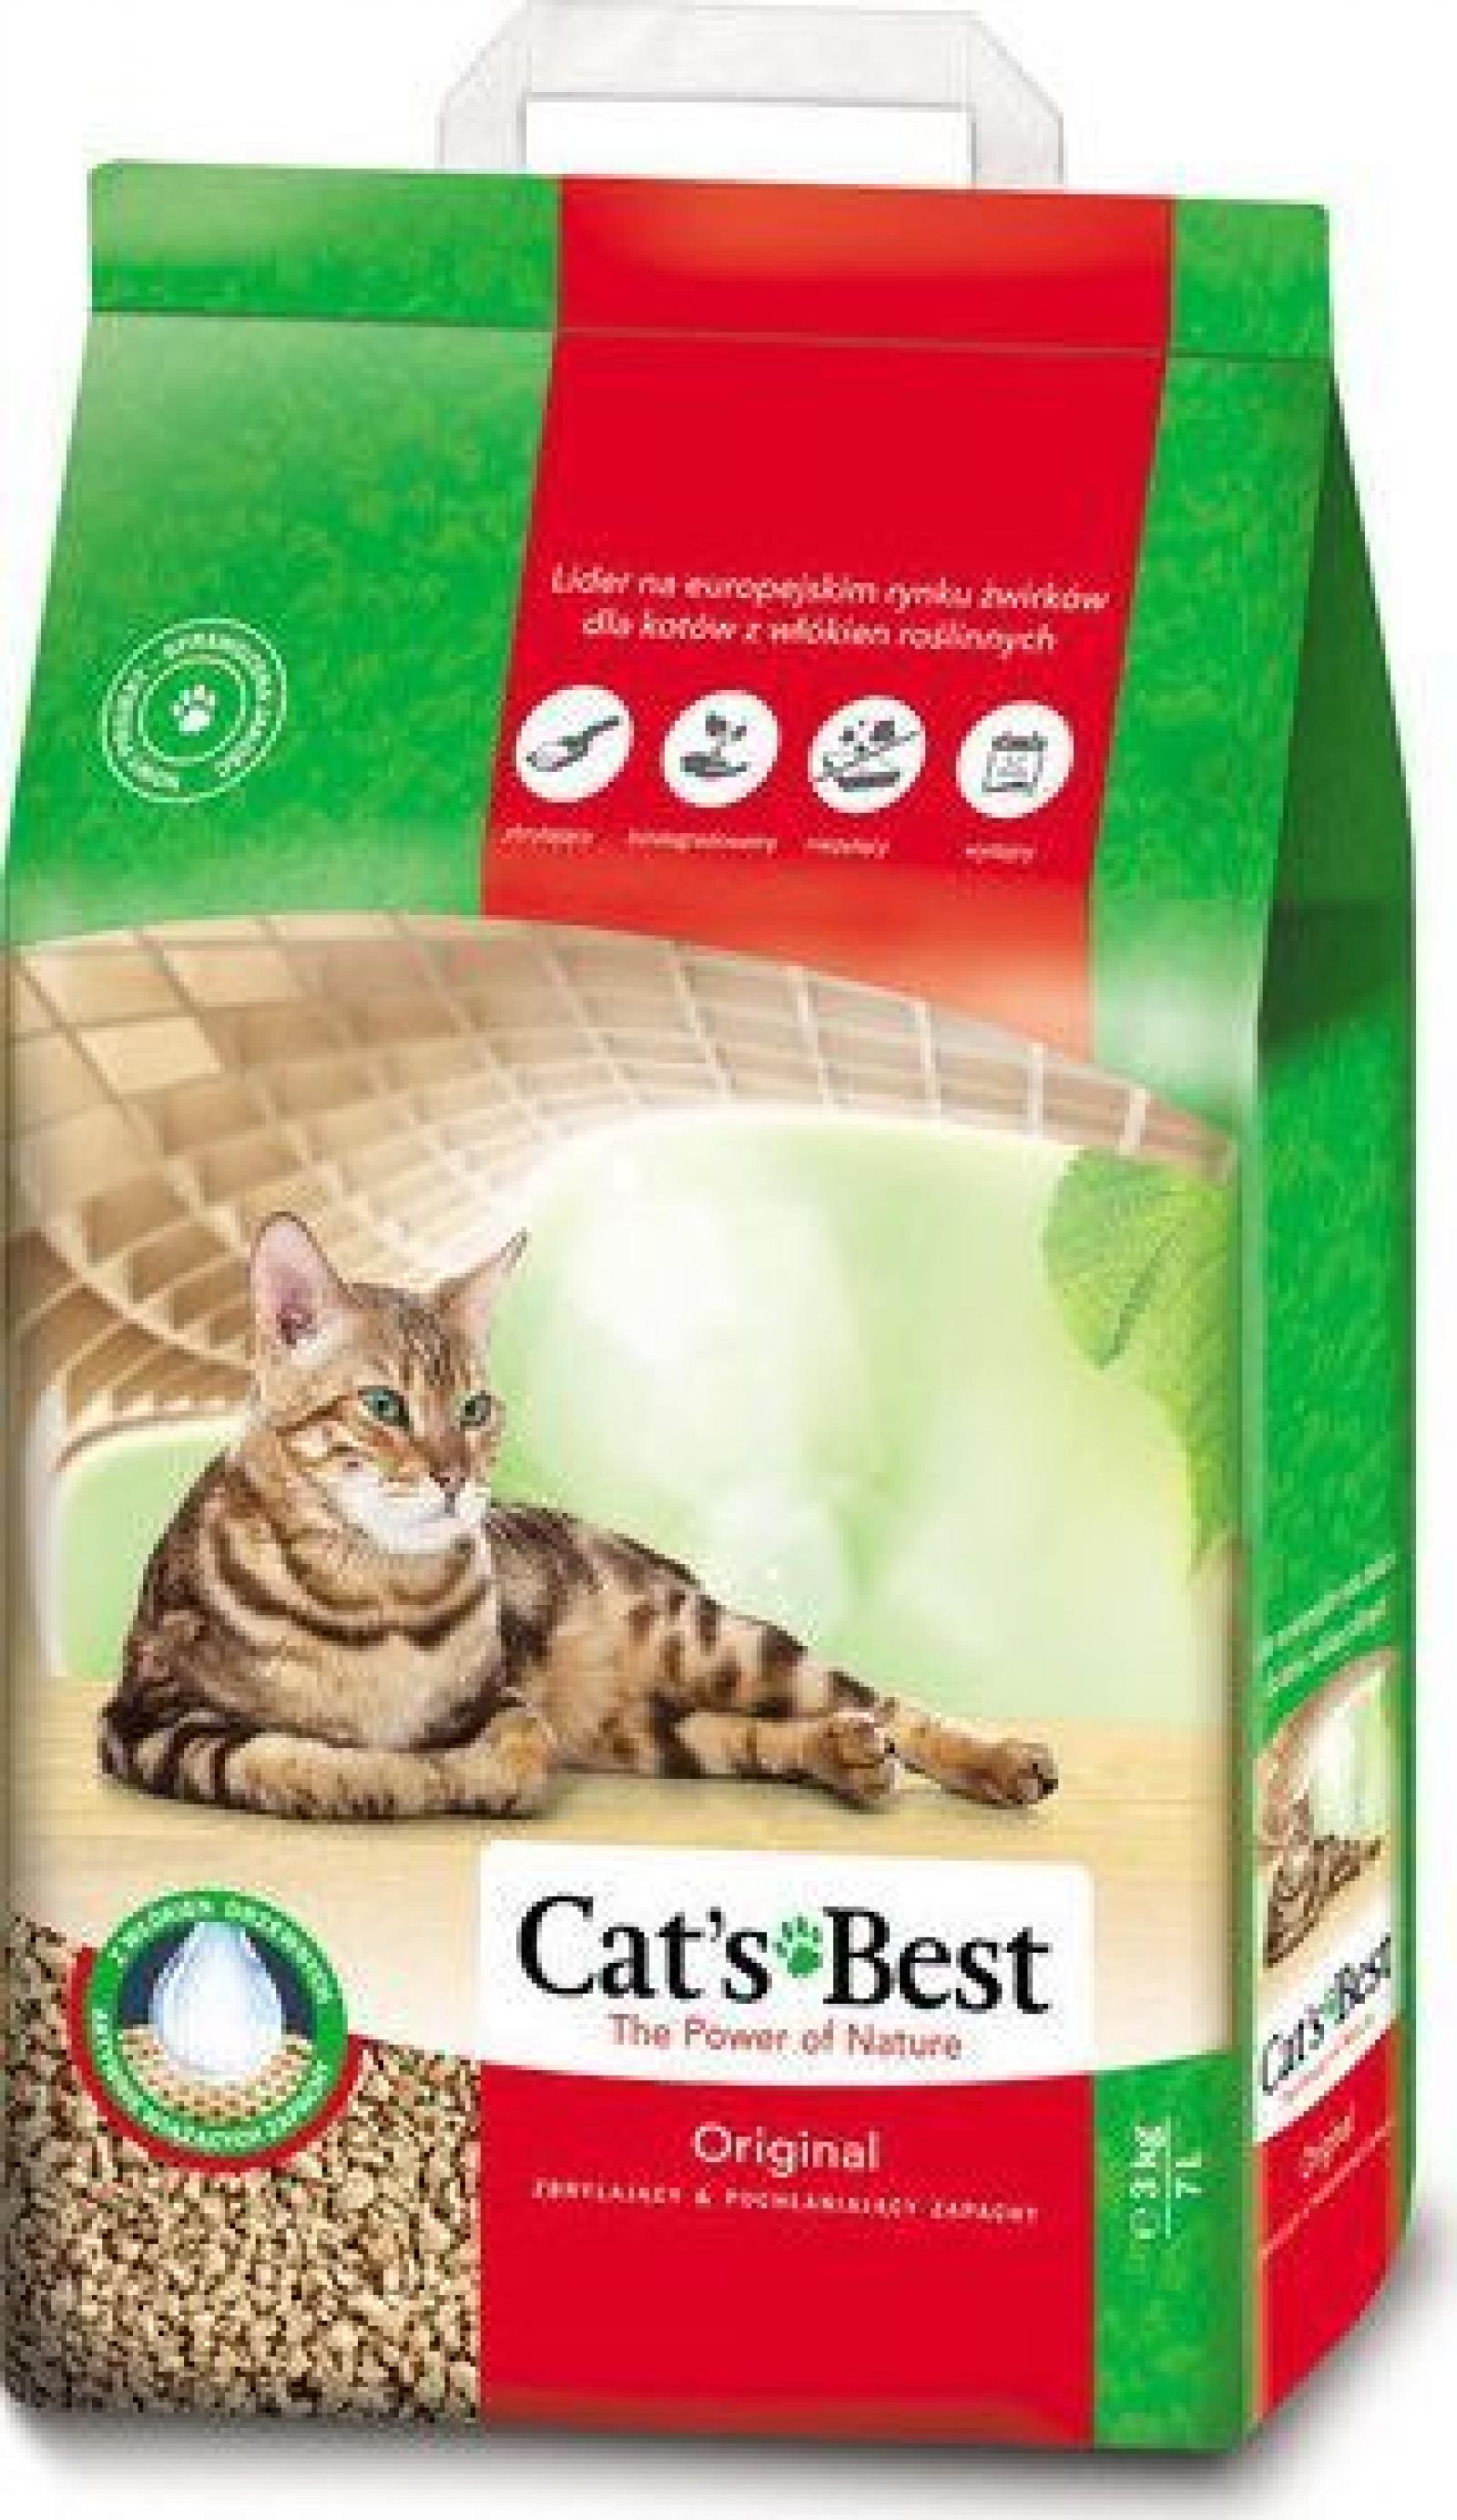 cats-best-1-jpg_572.jpg